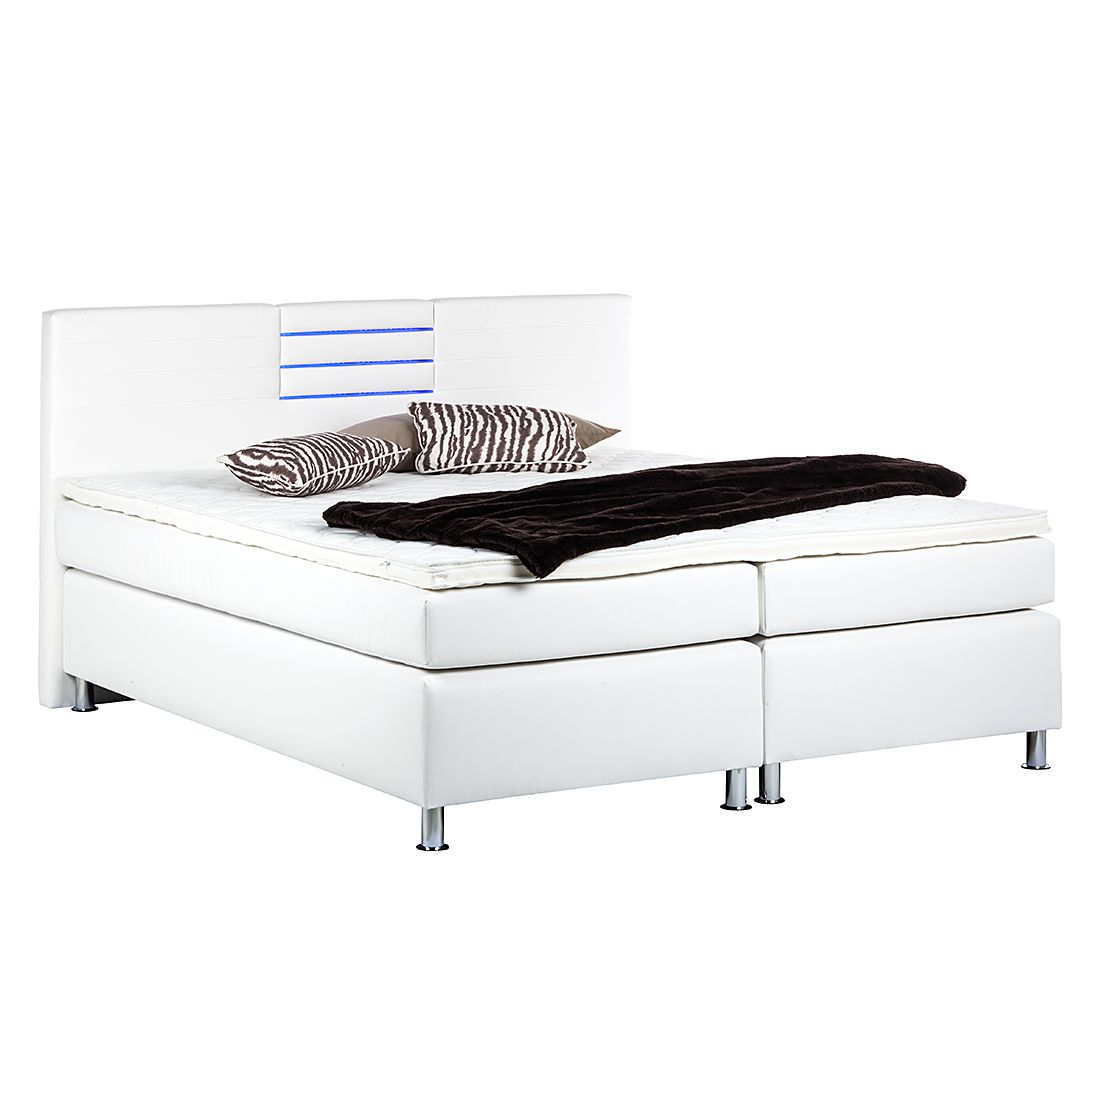 Boxspringbett Moonlight II – inklusive Topper – 180 x 200cm – Bonellfederkern – Bonellfederkernmatratze – Weiß, Nova Dream Sleepline kaufen